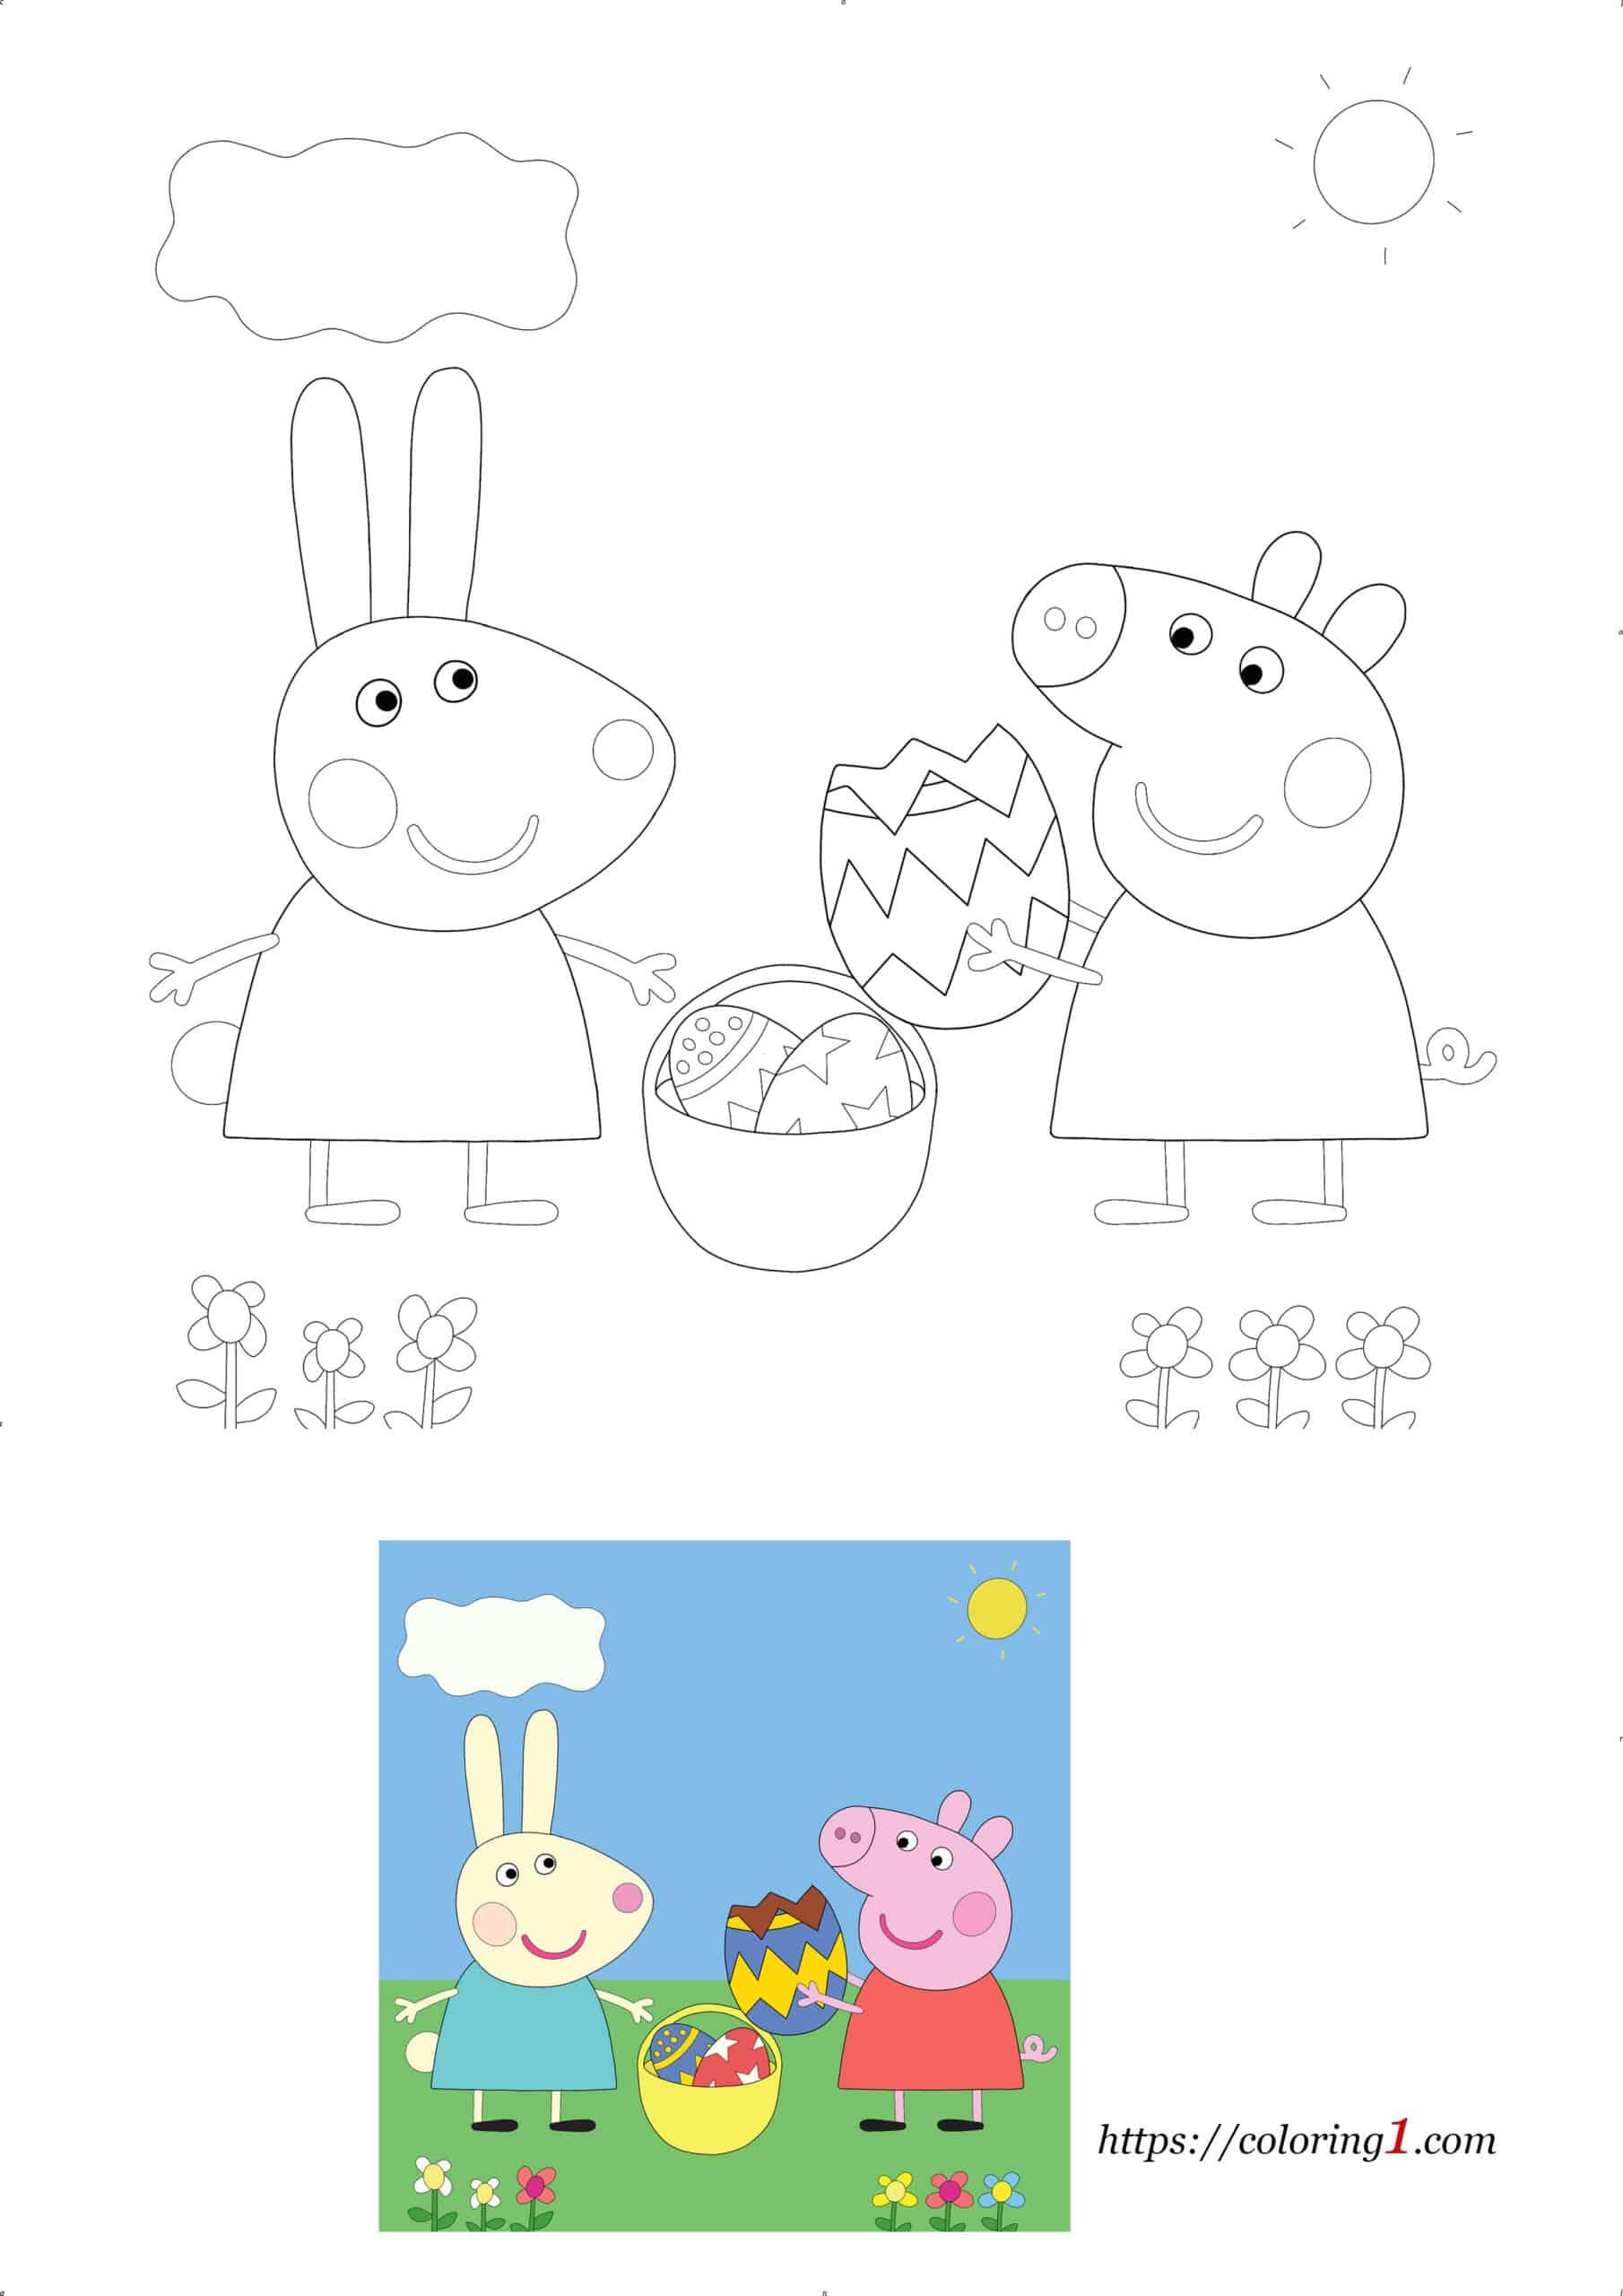 Coloriage Dessin Peppa Pig de Pâques À Imprimer Gratuit